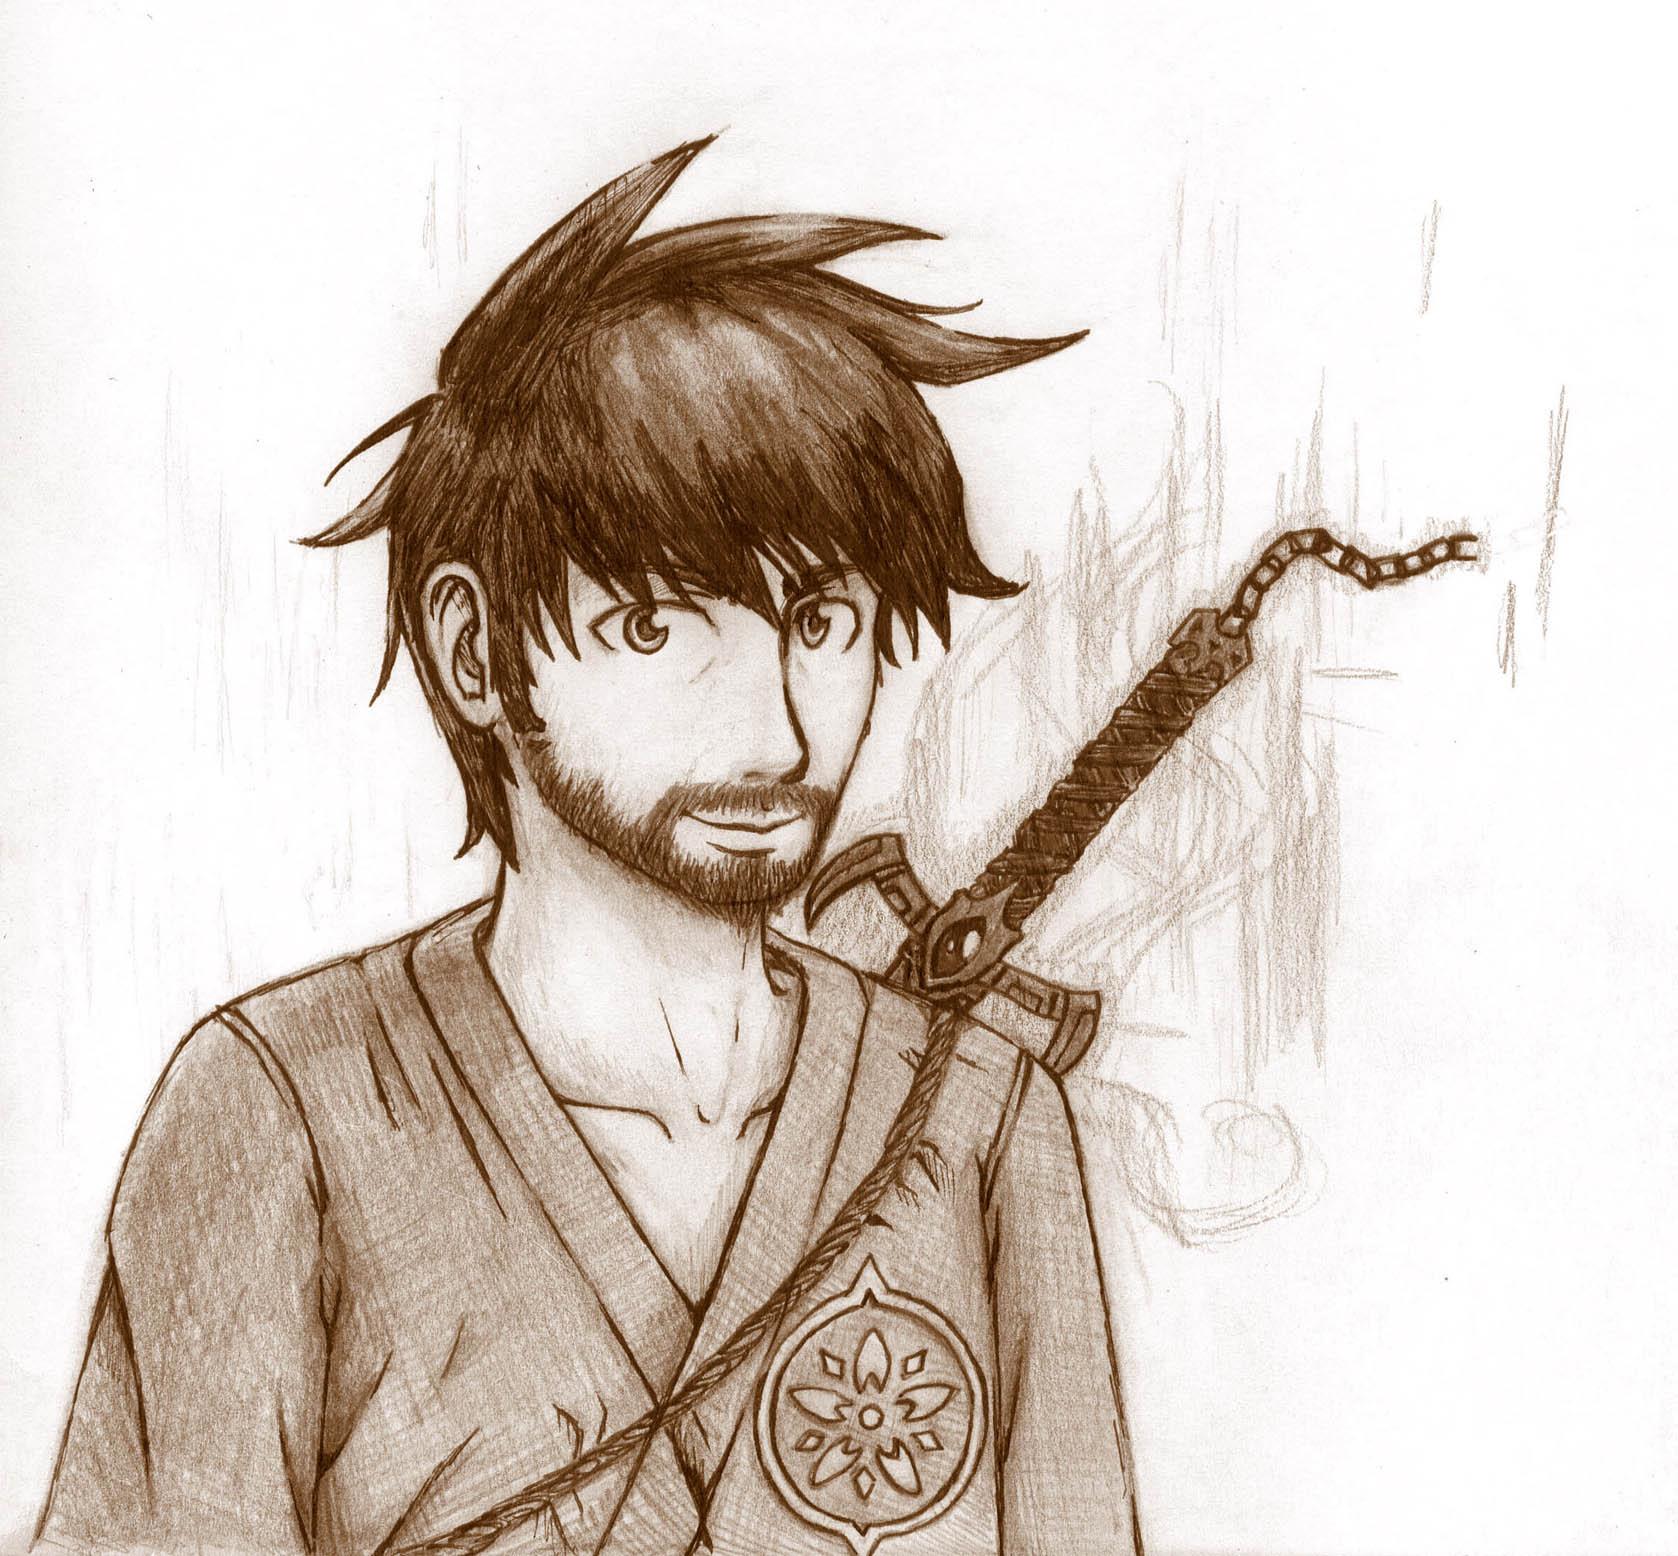 Alexander the samurai